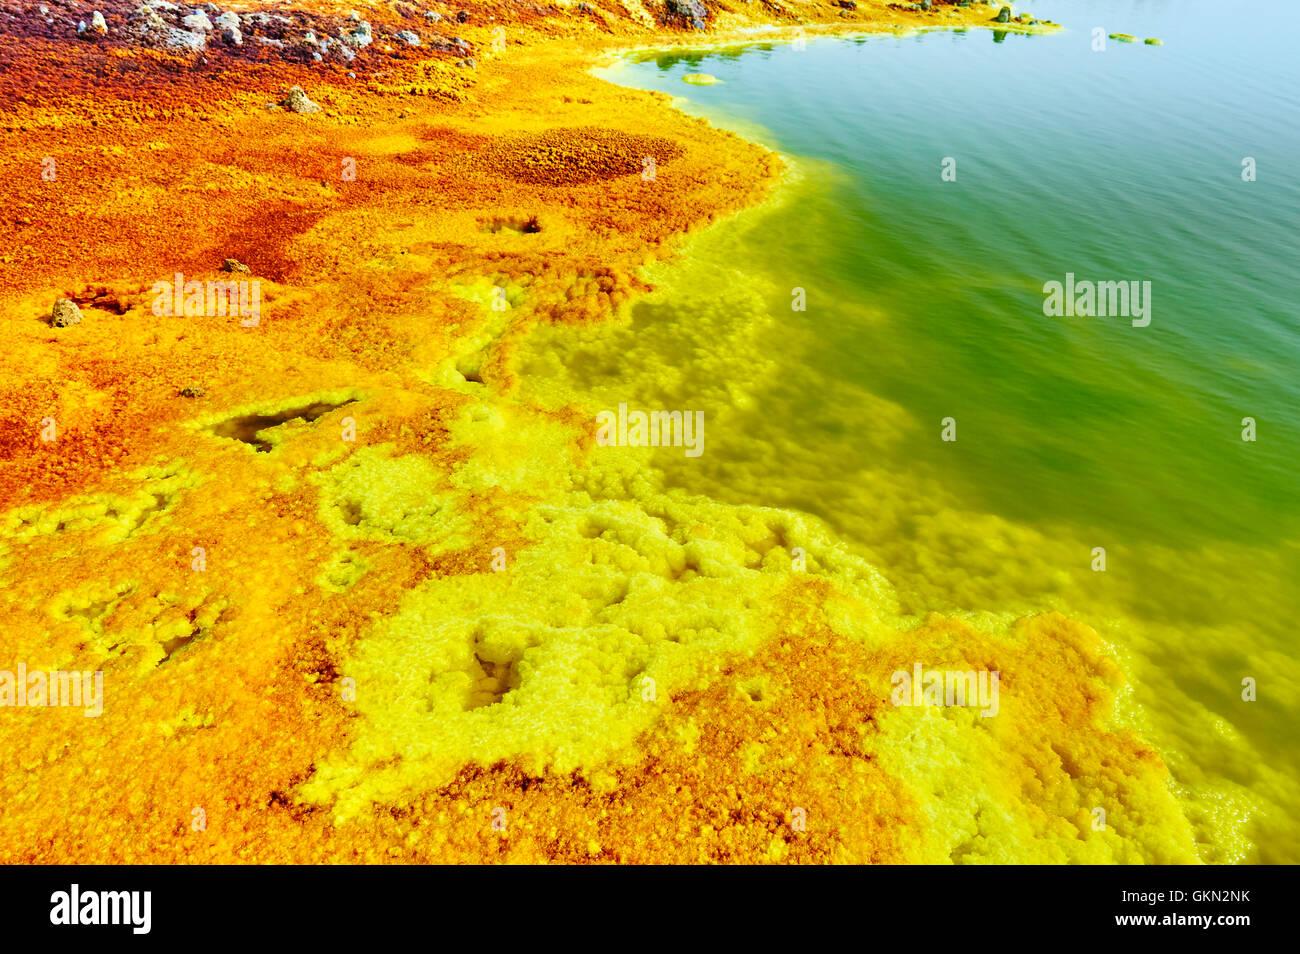 DANAKIL DEPRESSION, ETHIOPIA - SEPT 20, 2013: Inside the explosion crater of Dallol volcano, Danakil Depression, - Stock Image